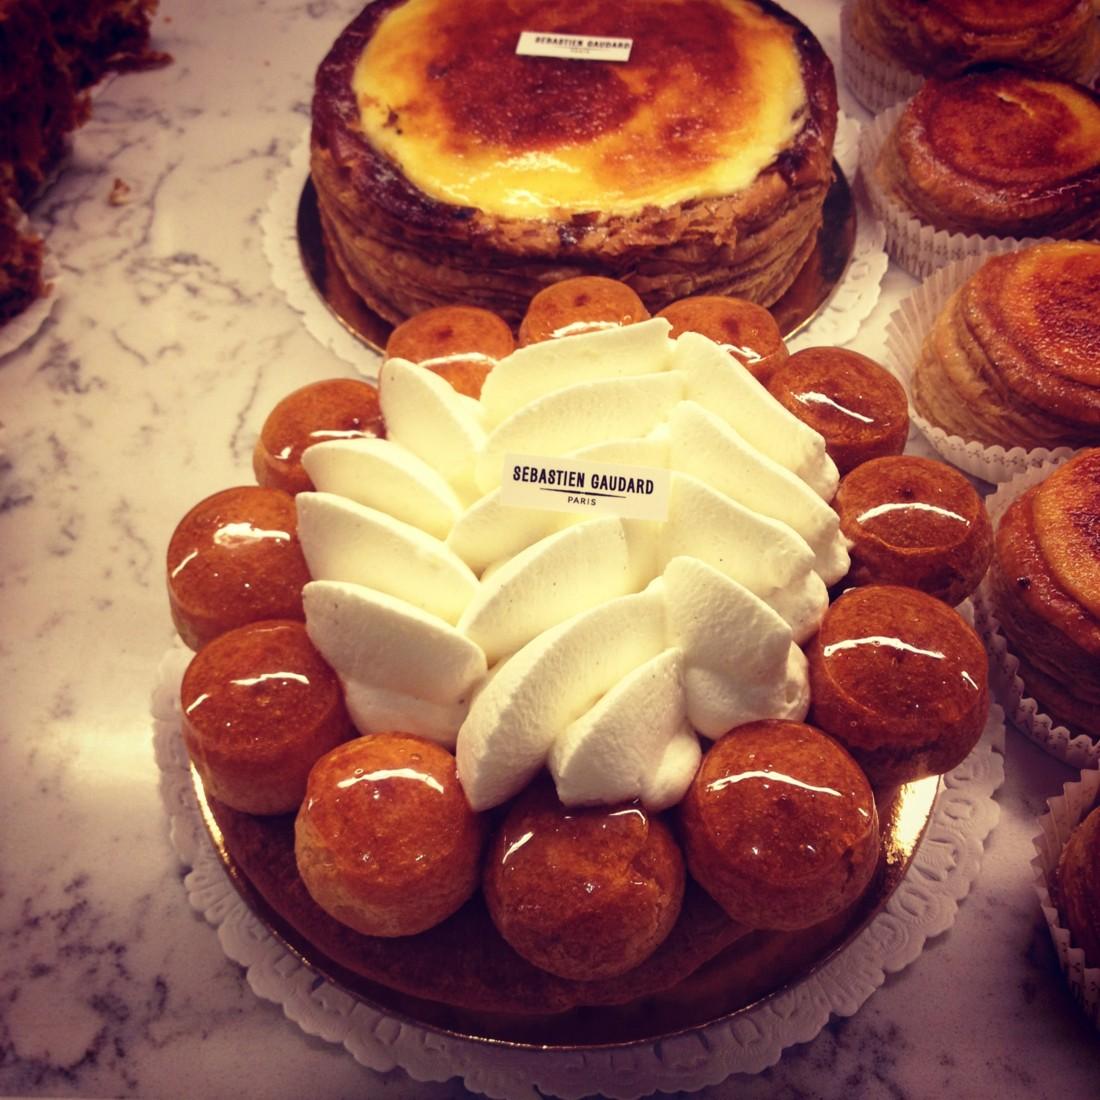 dessert choux et cr 232 me honor 233 s 233 bastien gaudard chef patissier rue des martyrs